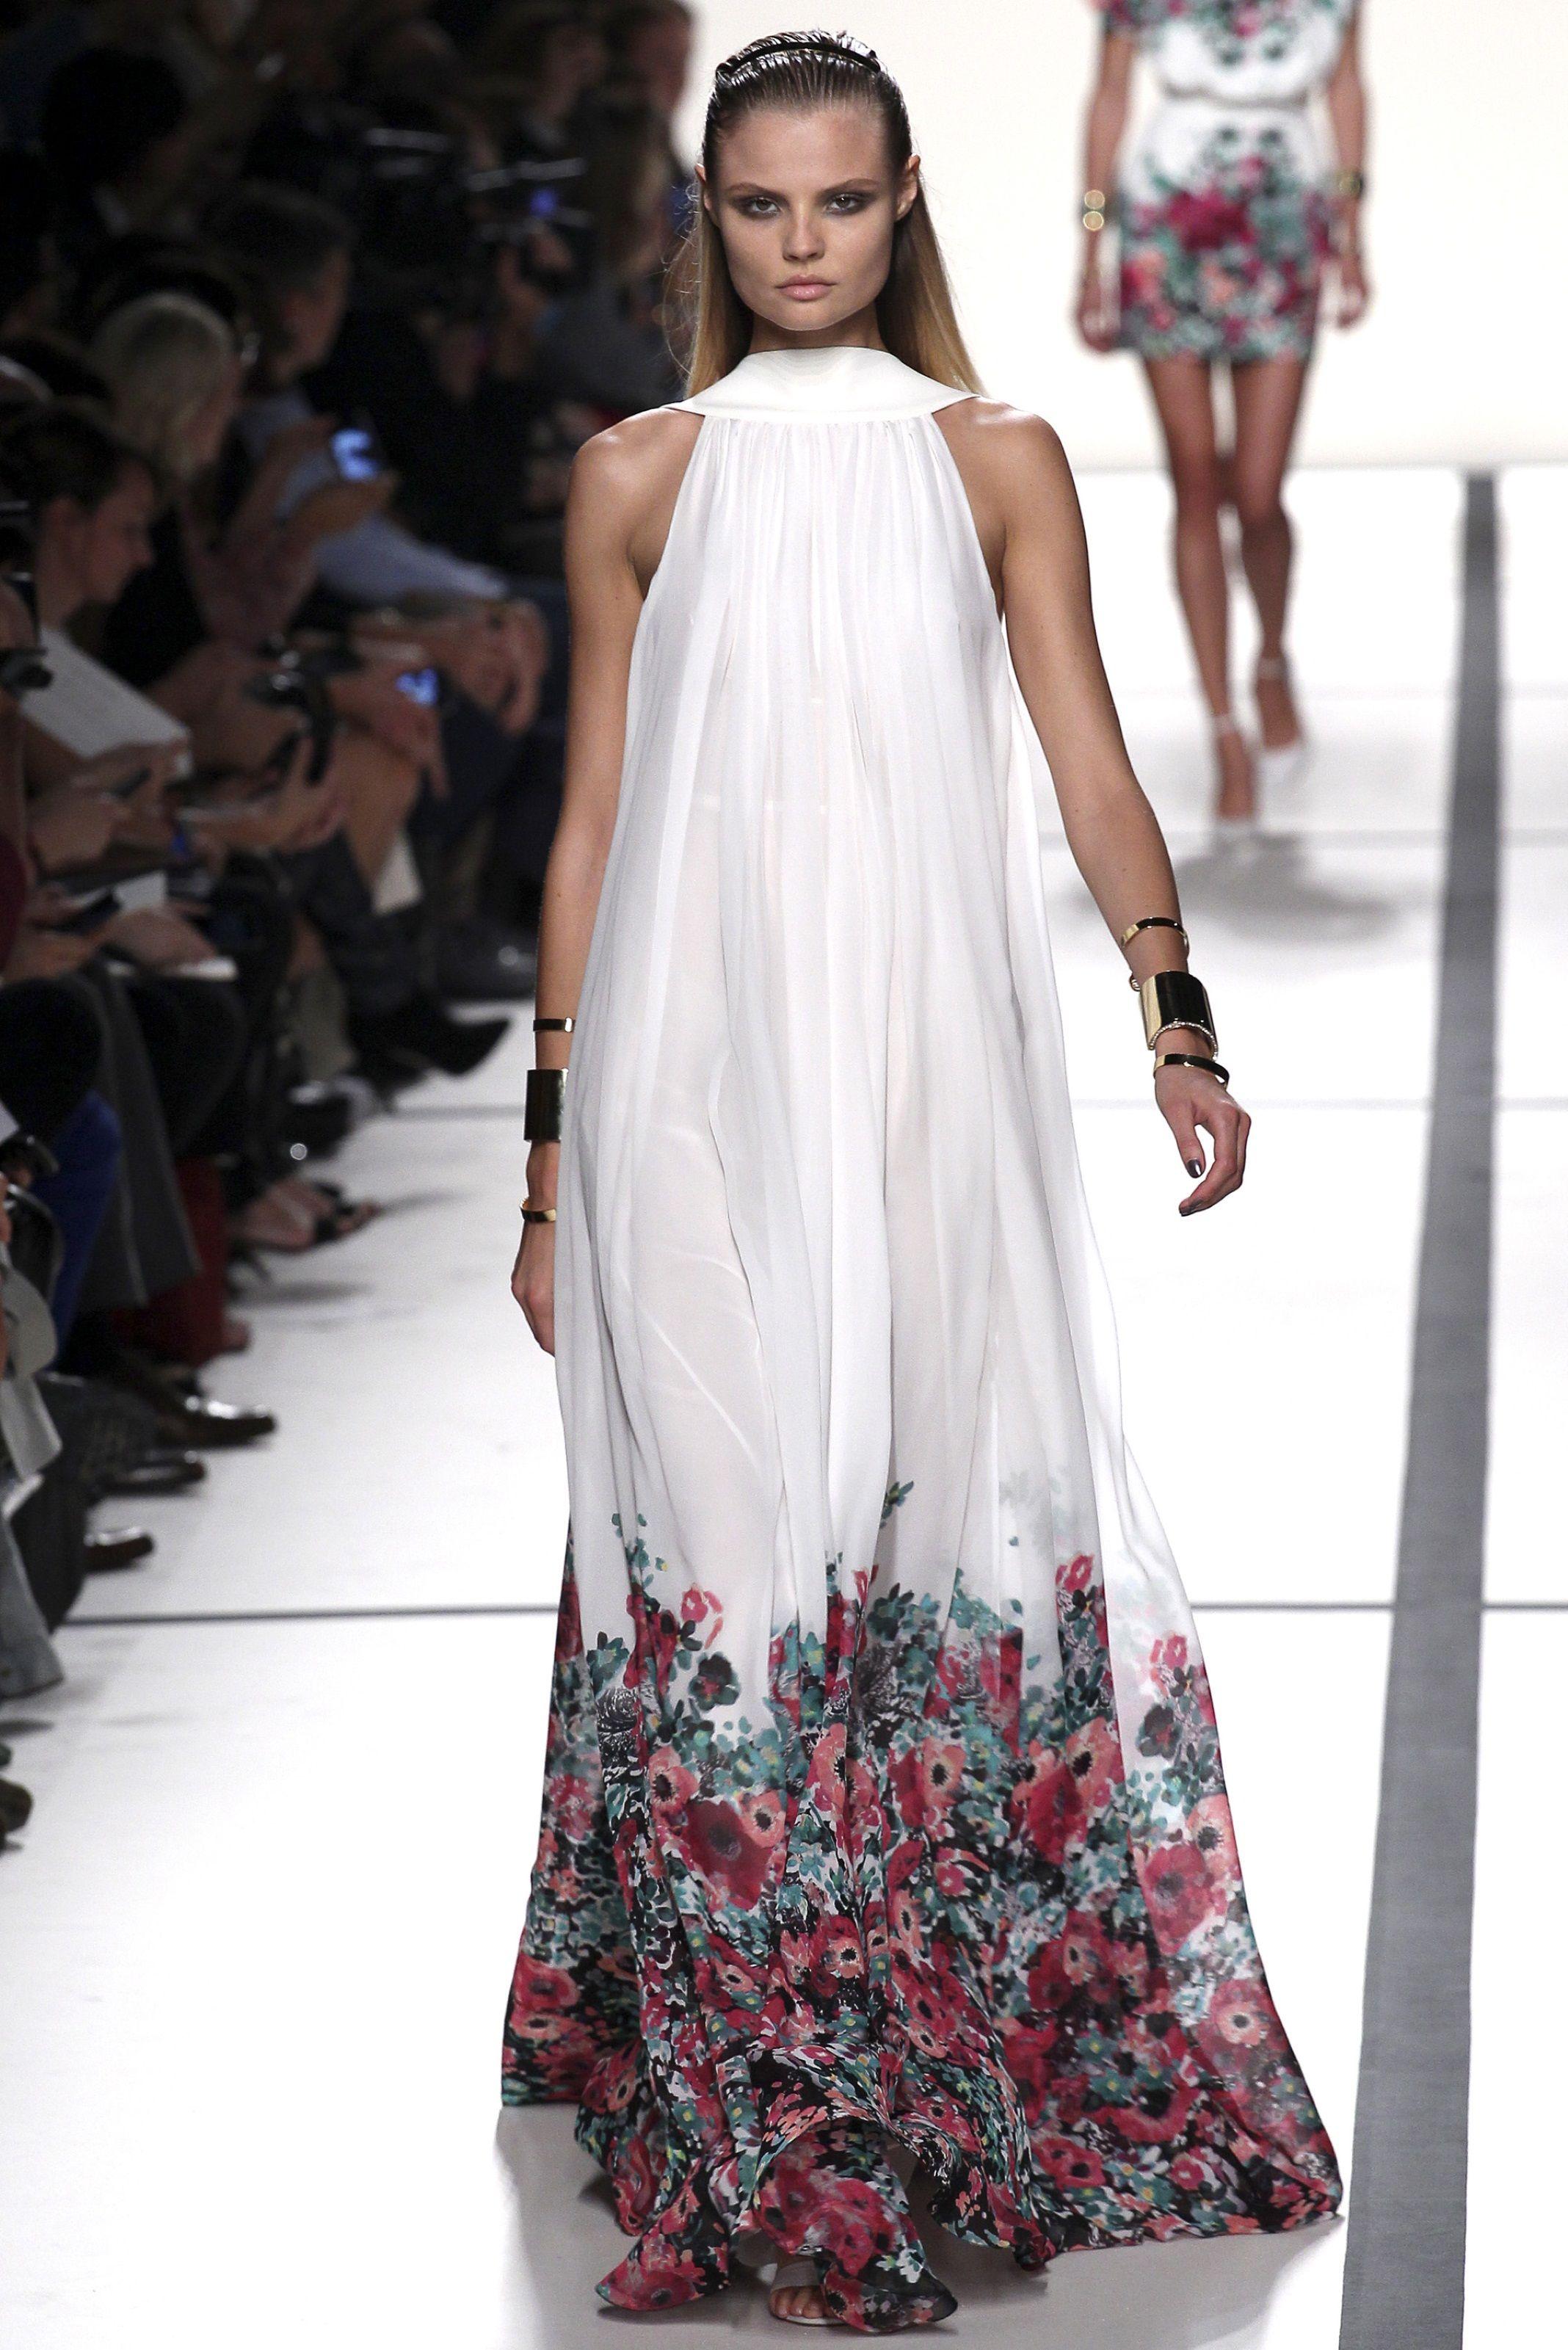 Dresses for Spring-Summer 2014